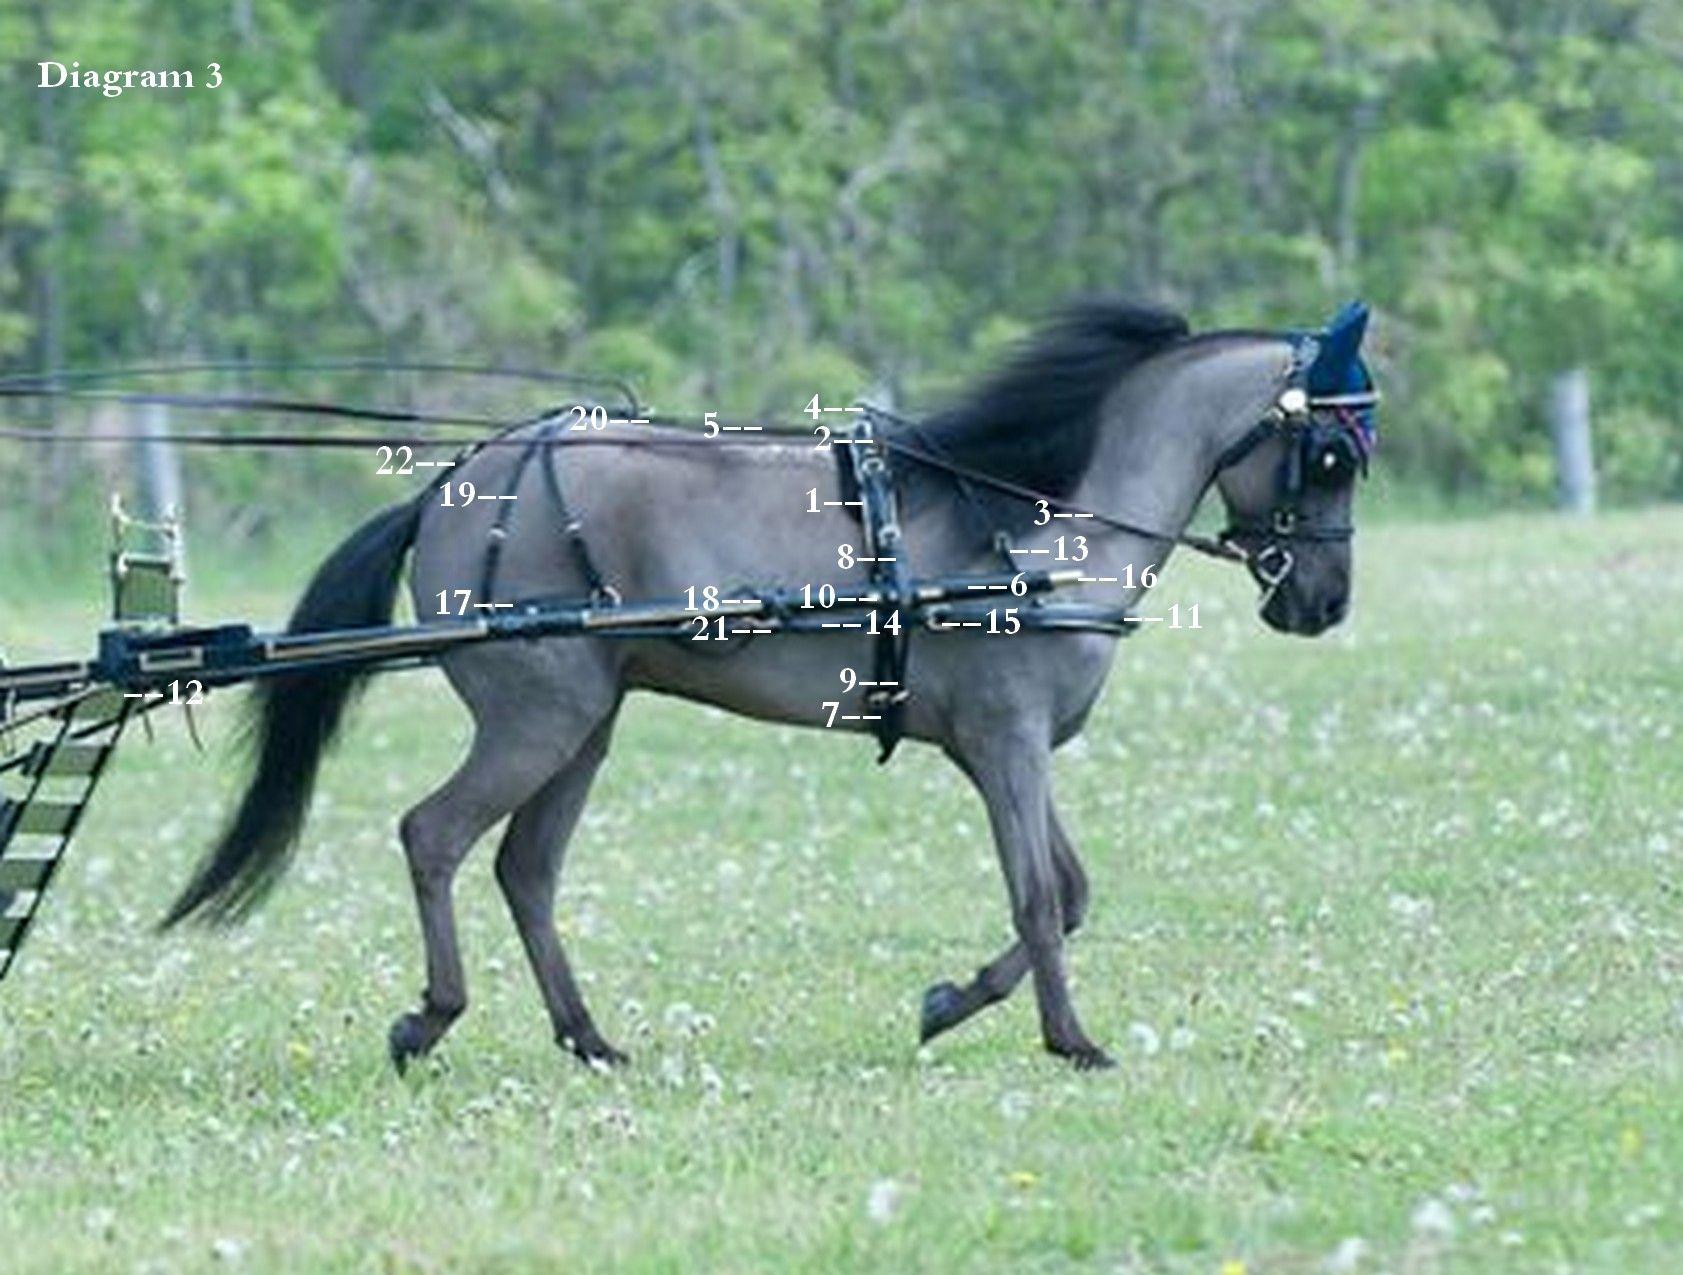 hight resolution of the miniature horse harness ozarkcanada horse harness harness racing miniature shetland pony